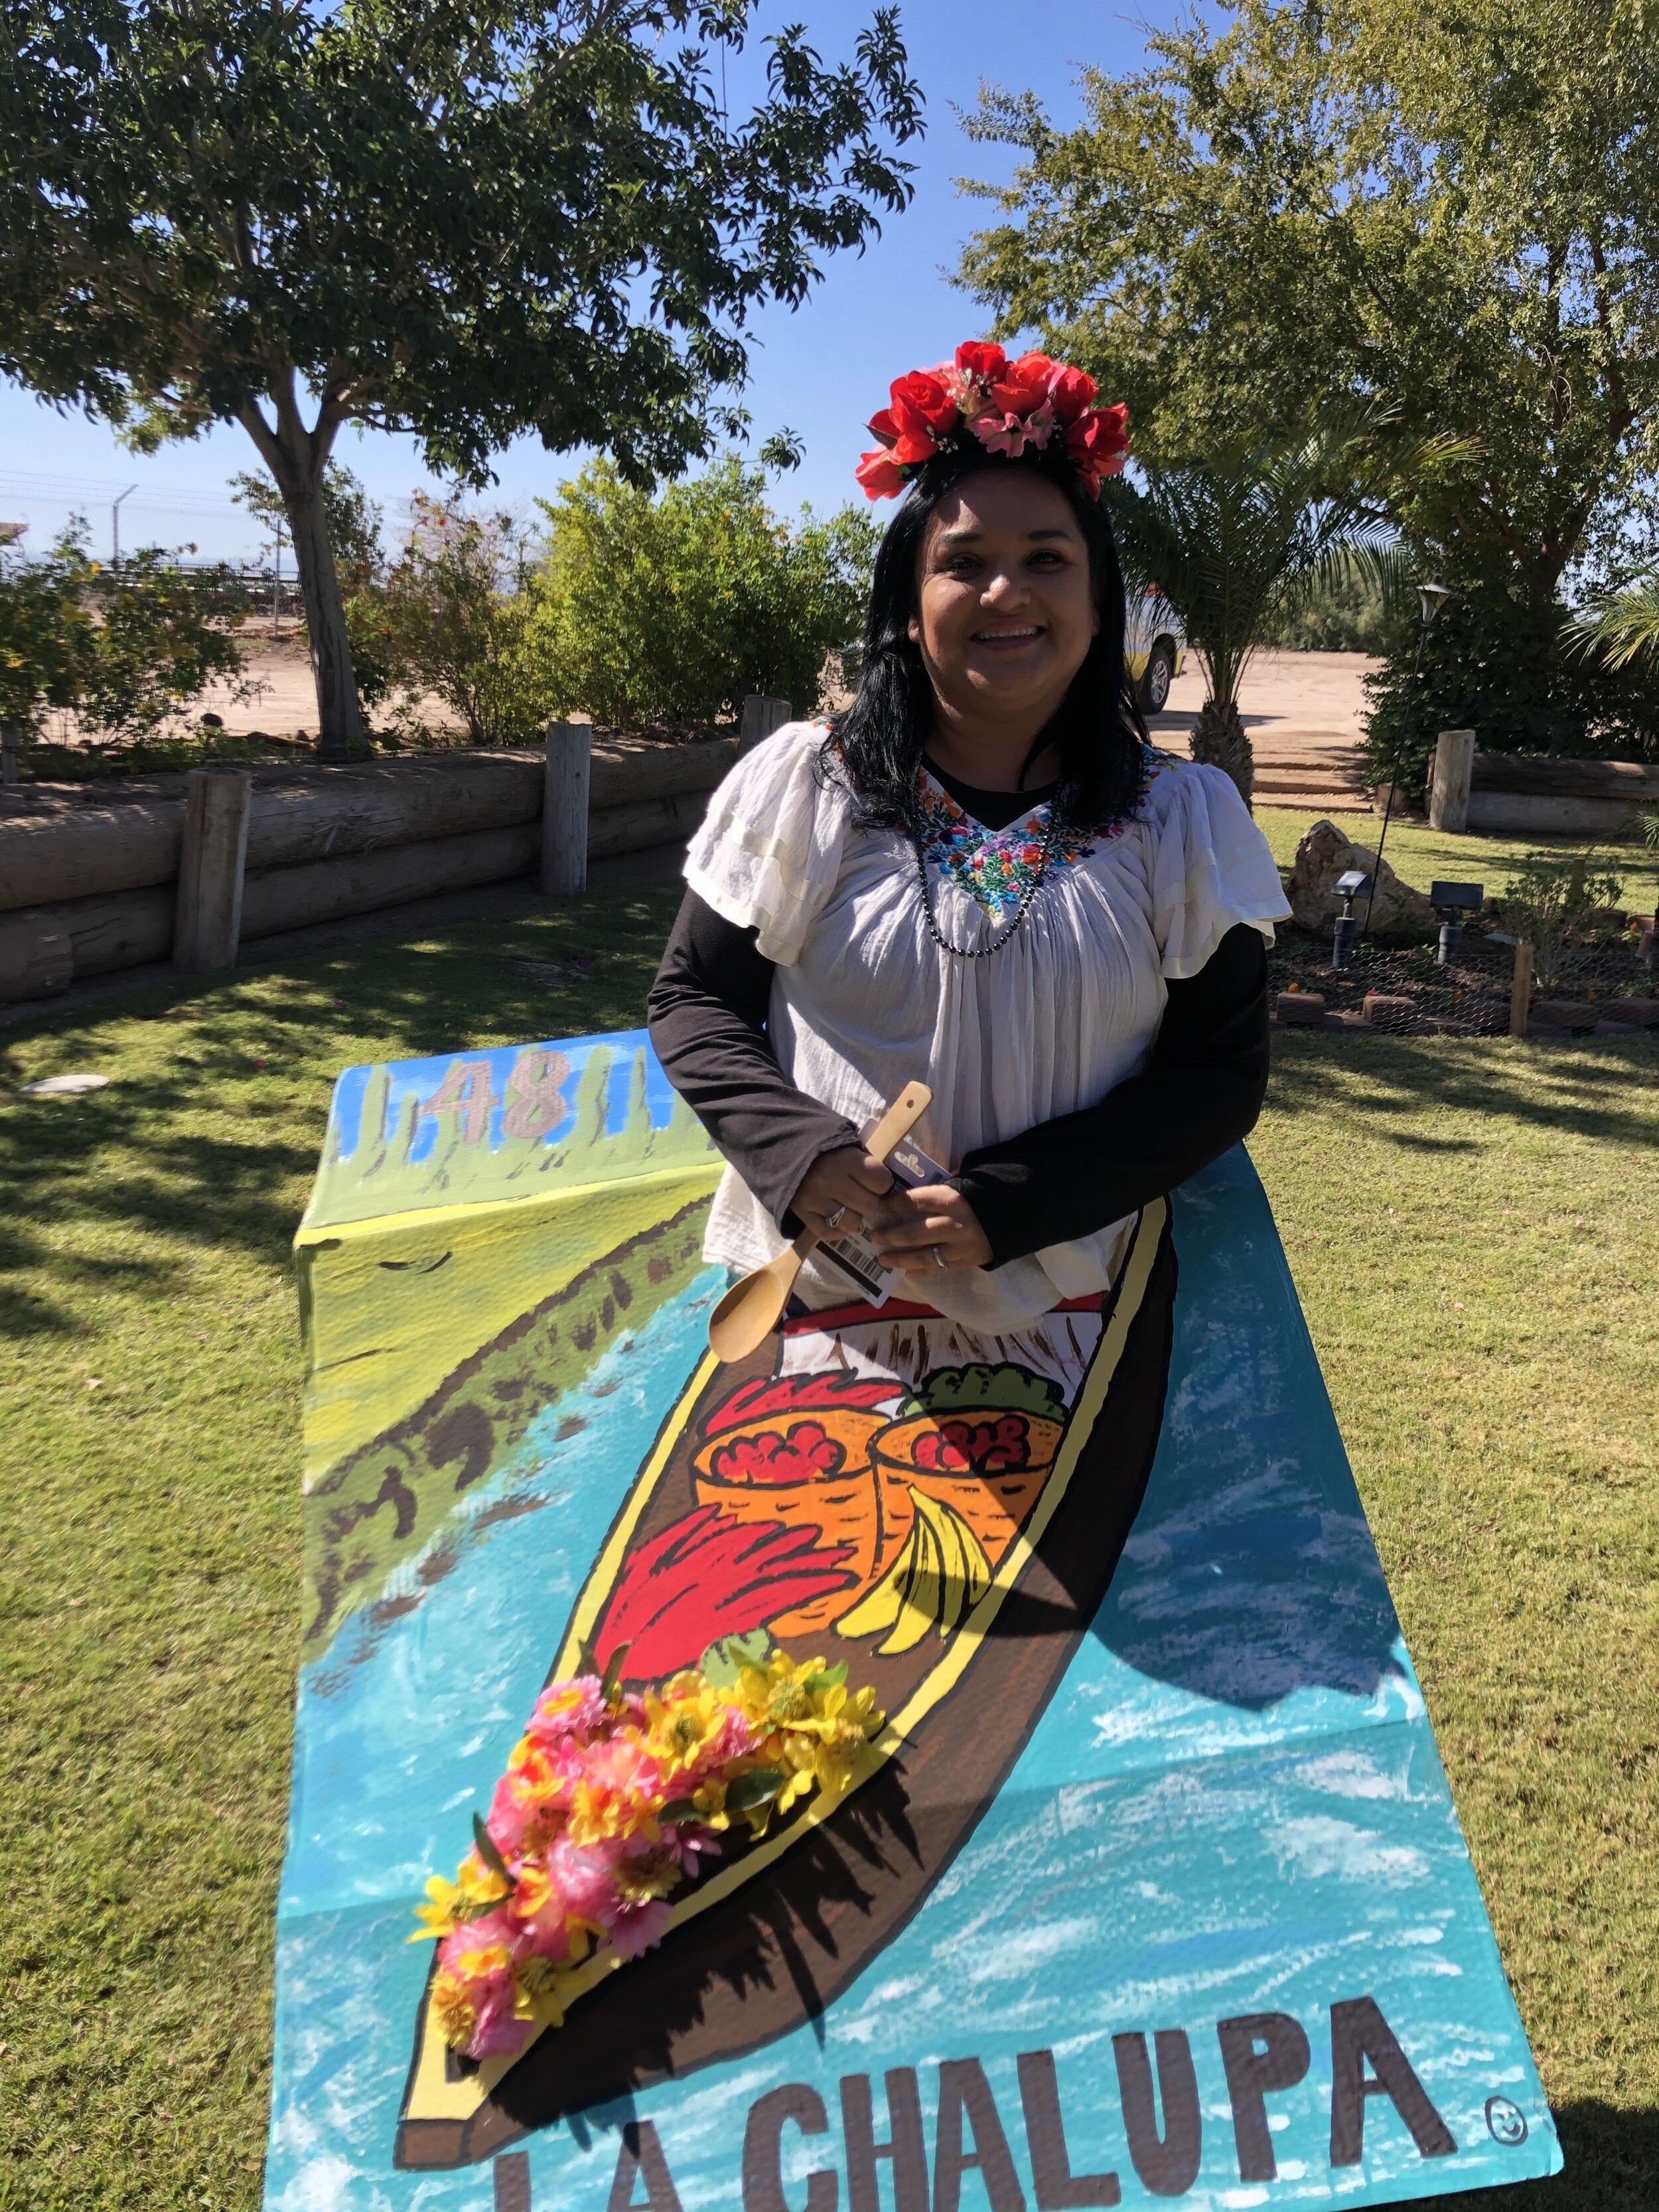 Winner of the costume contest, Adriana Castro!